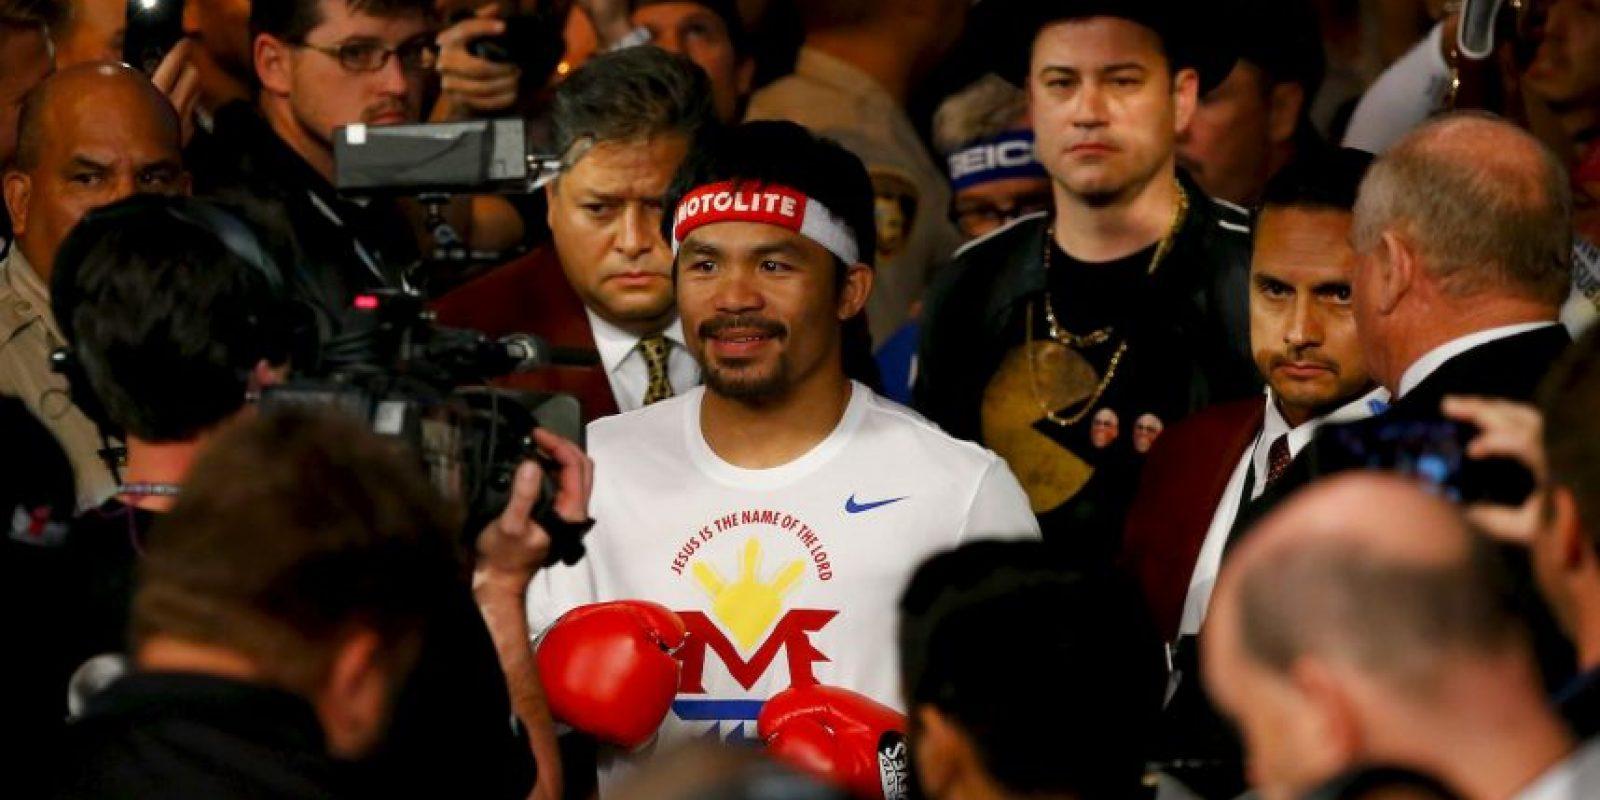 Así salió Manny Pacquiao. Foto:Getty Images